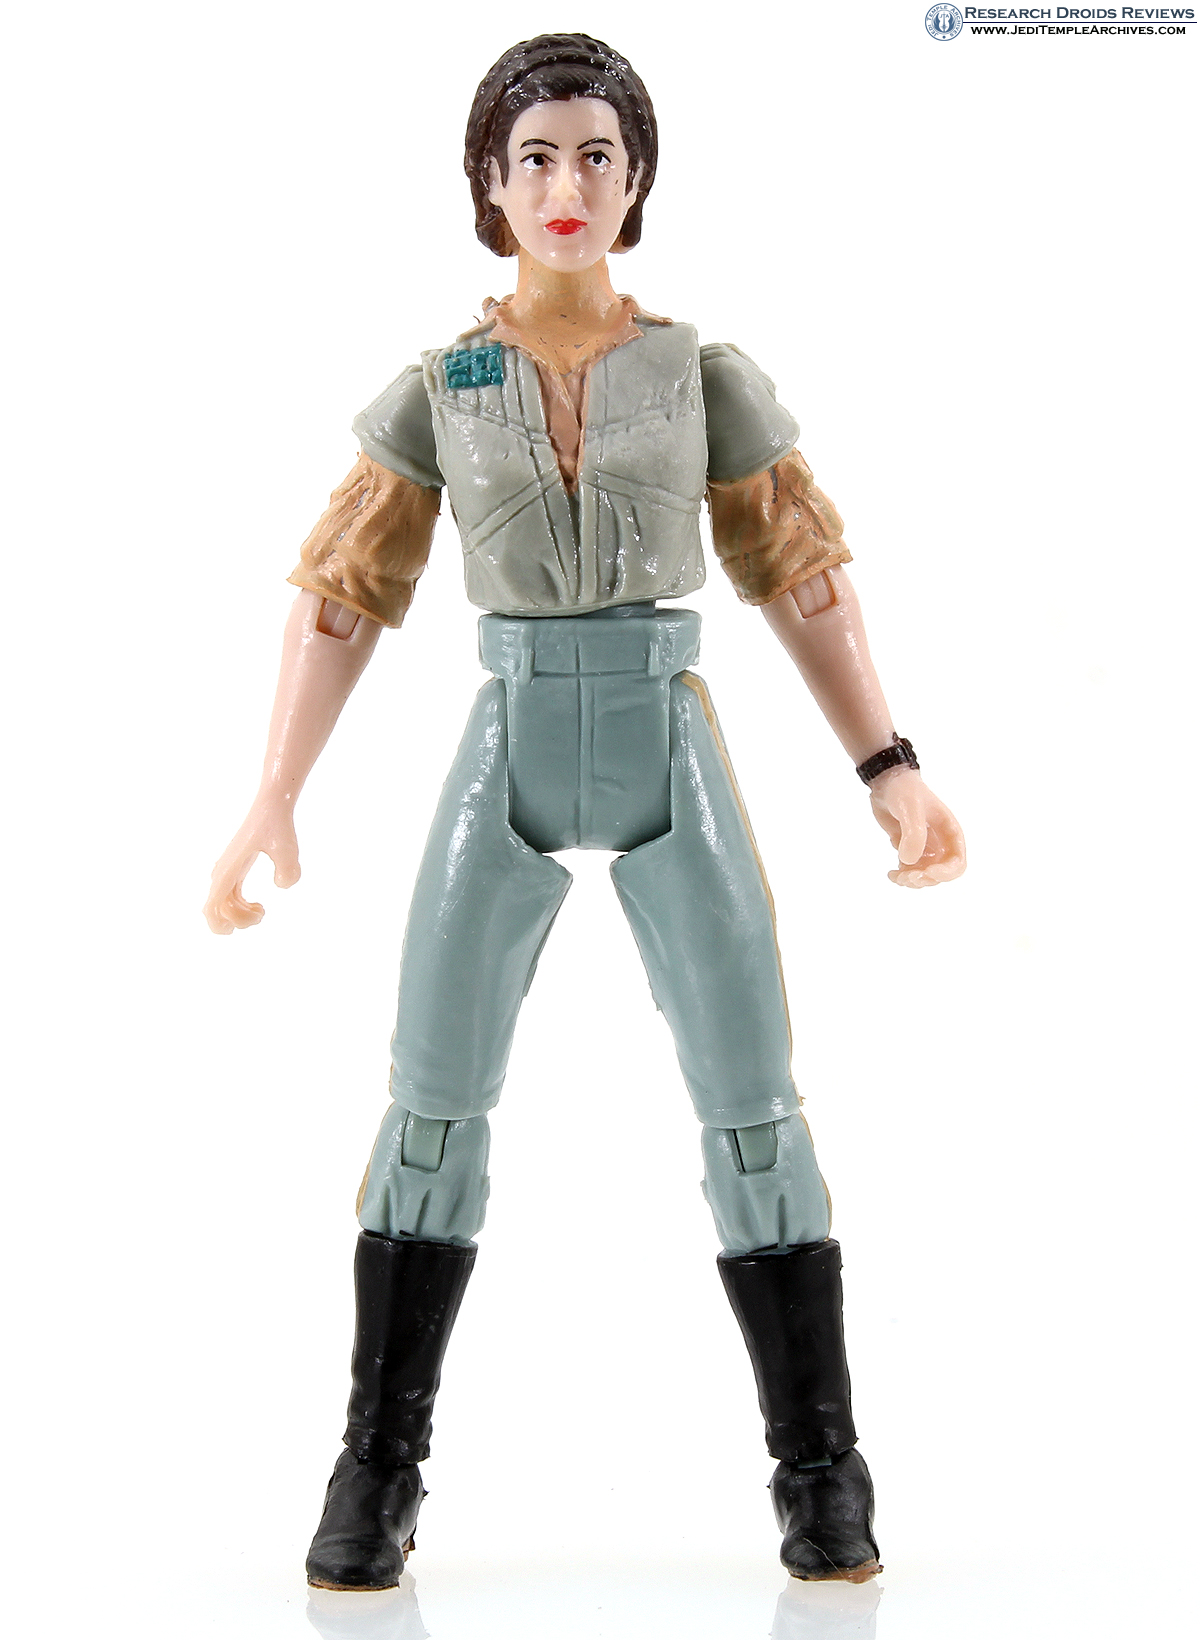 Princess Leia | Battle of Endor Multipack